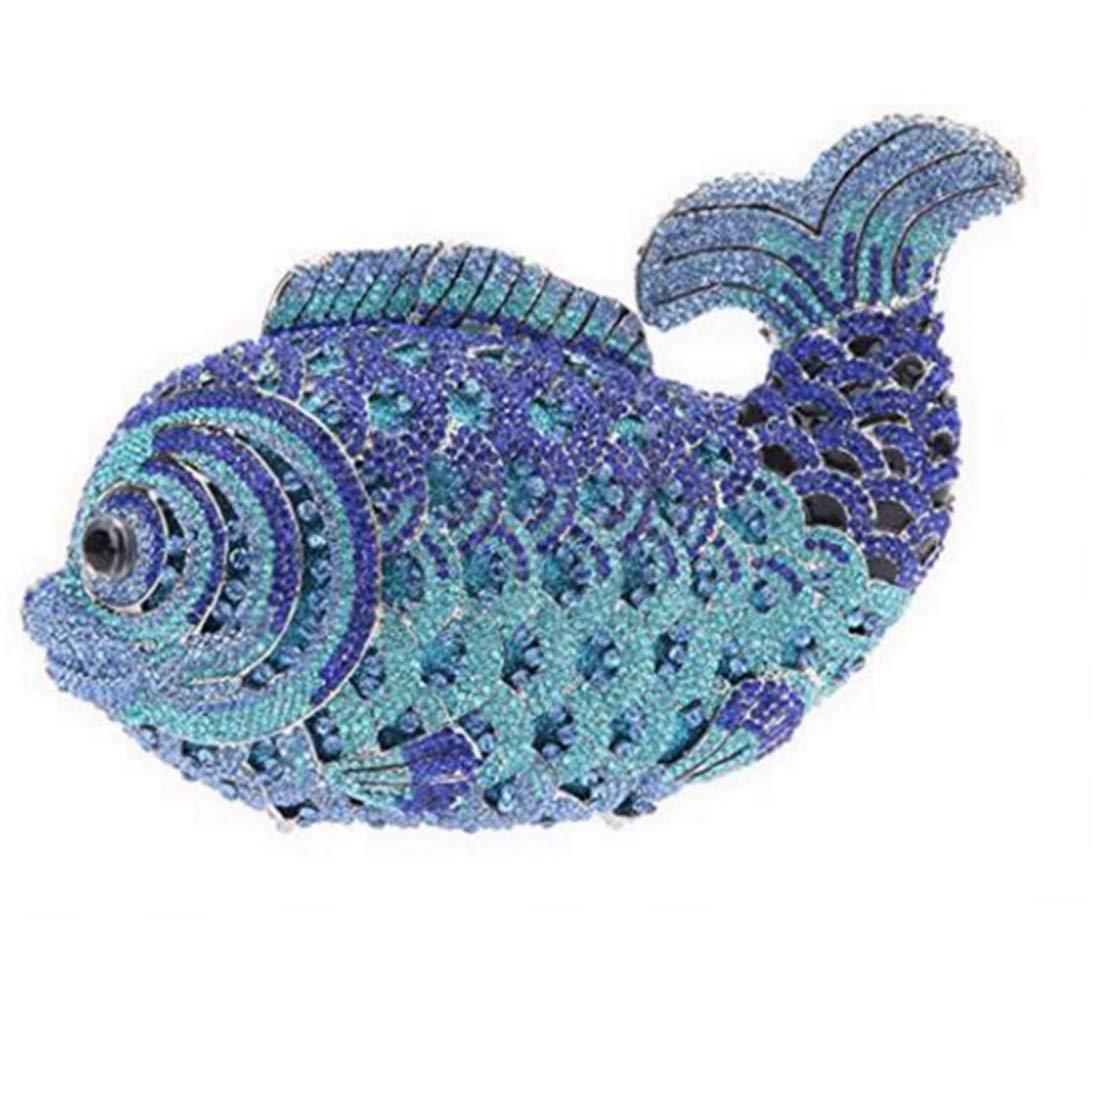 YUKILOCC Women Fish Crystal Clutch Evening Bags Handbag Animal Cross Body Bag (Color : Blue)